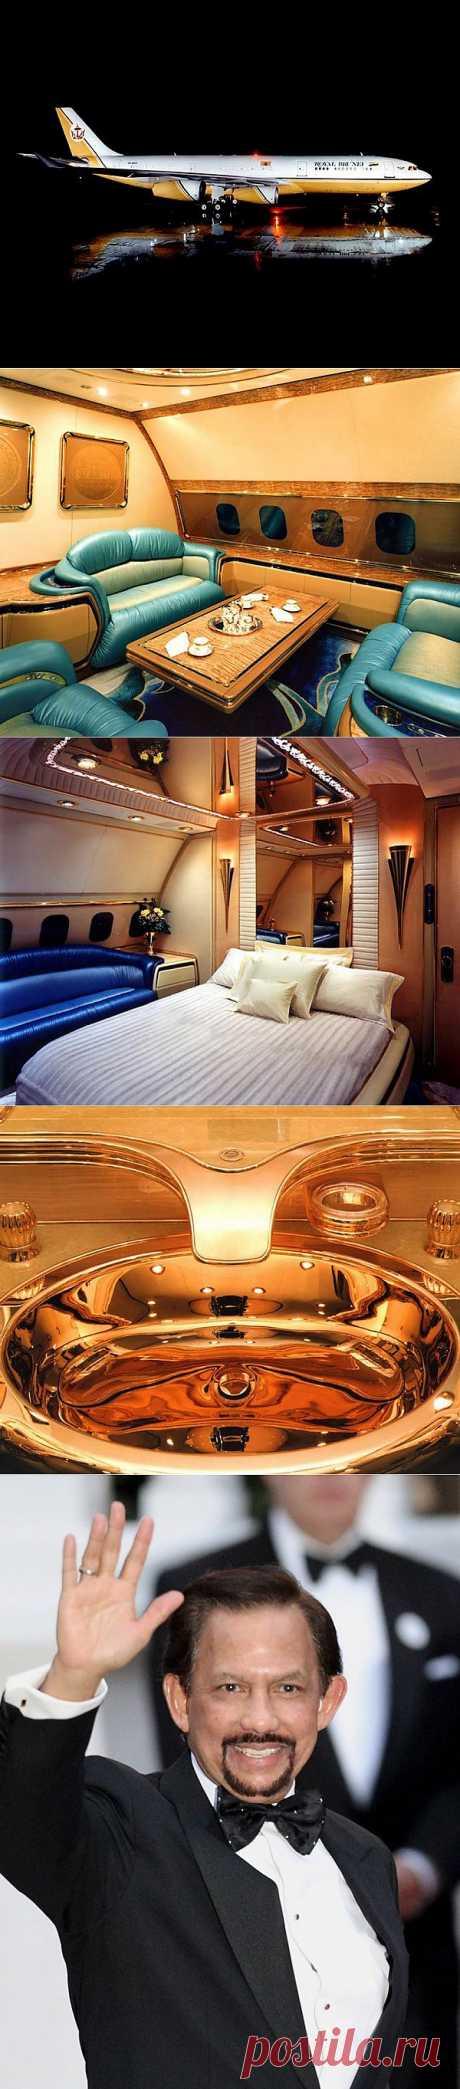 Самолёт султана Брунея : НОВОСТИ В ФОТОГРАФИЯХ